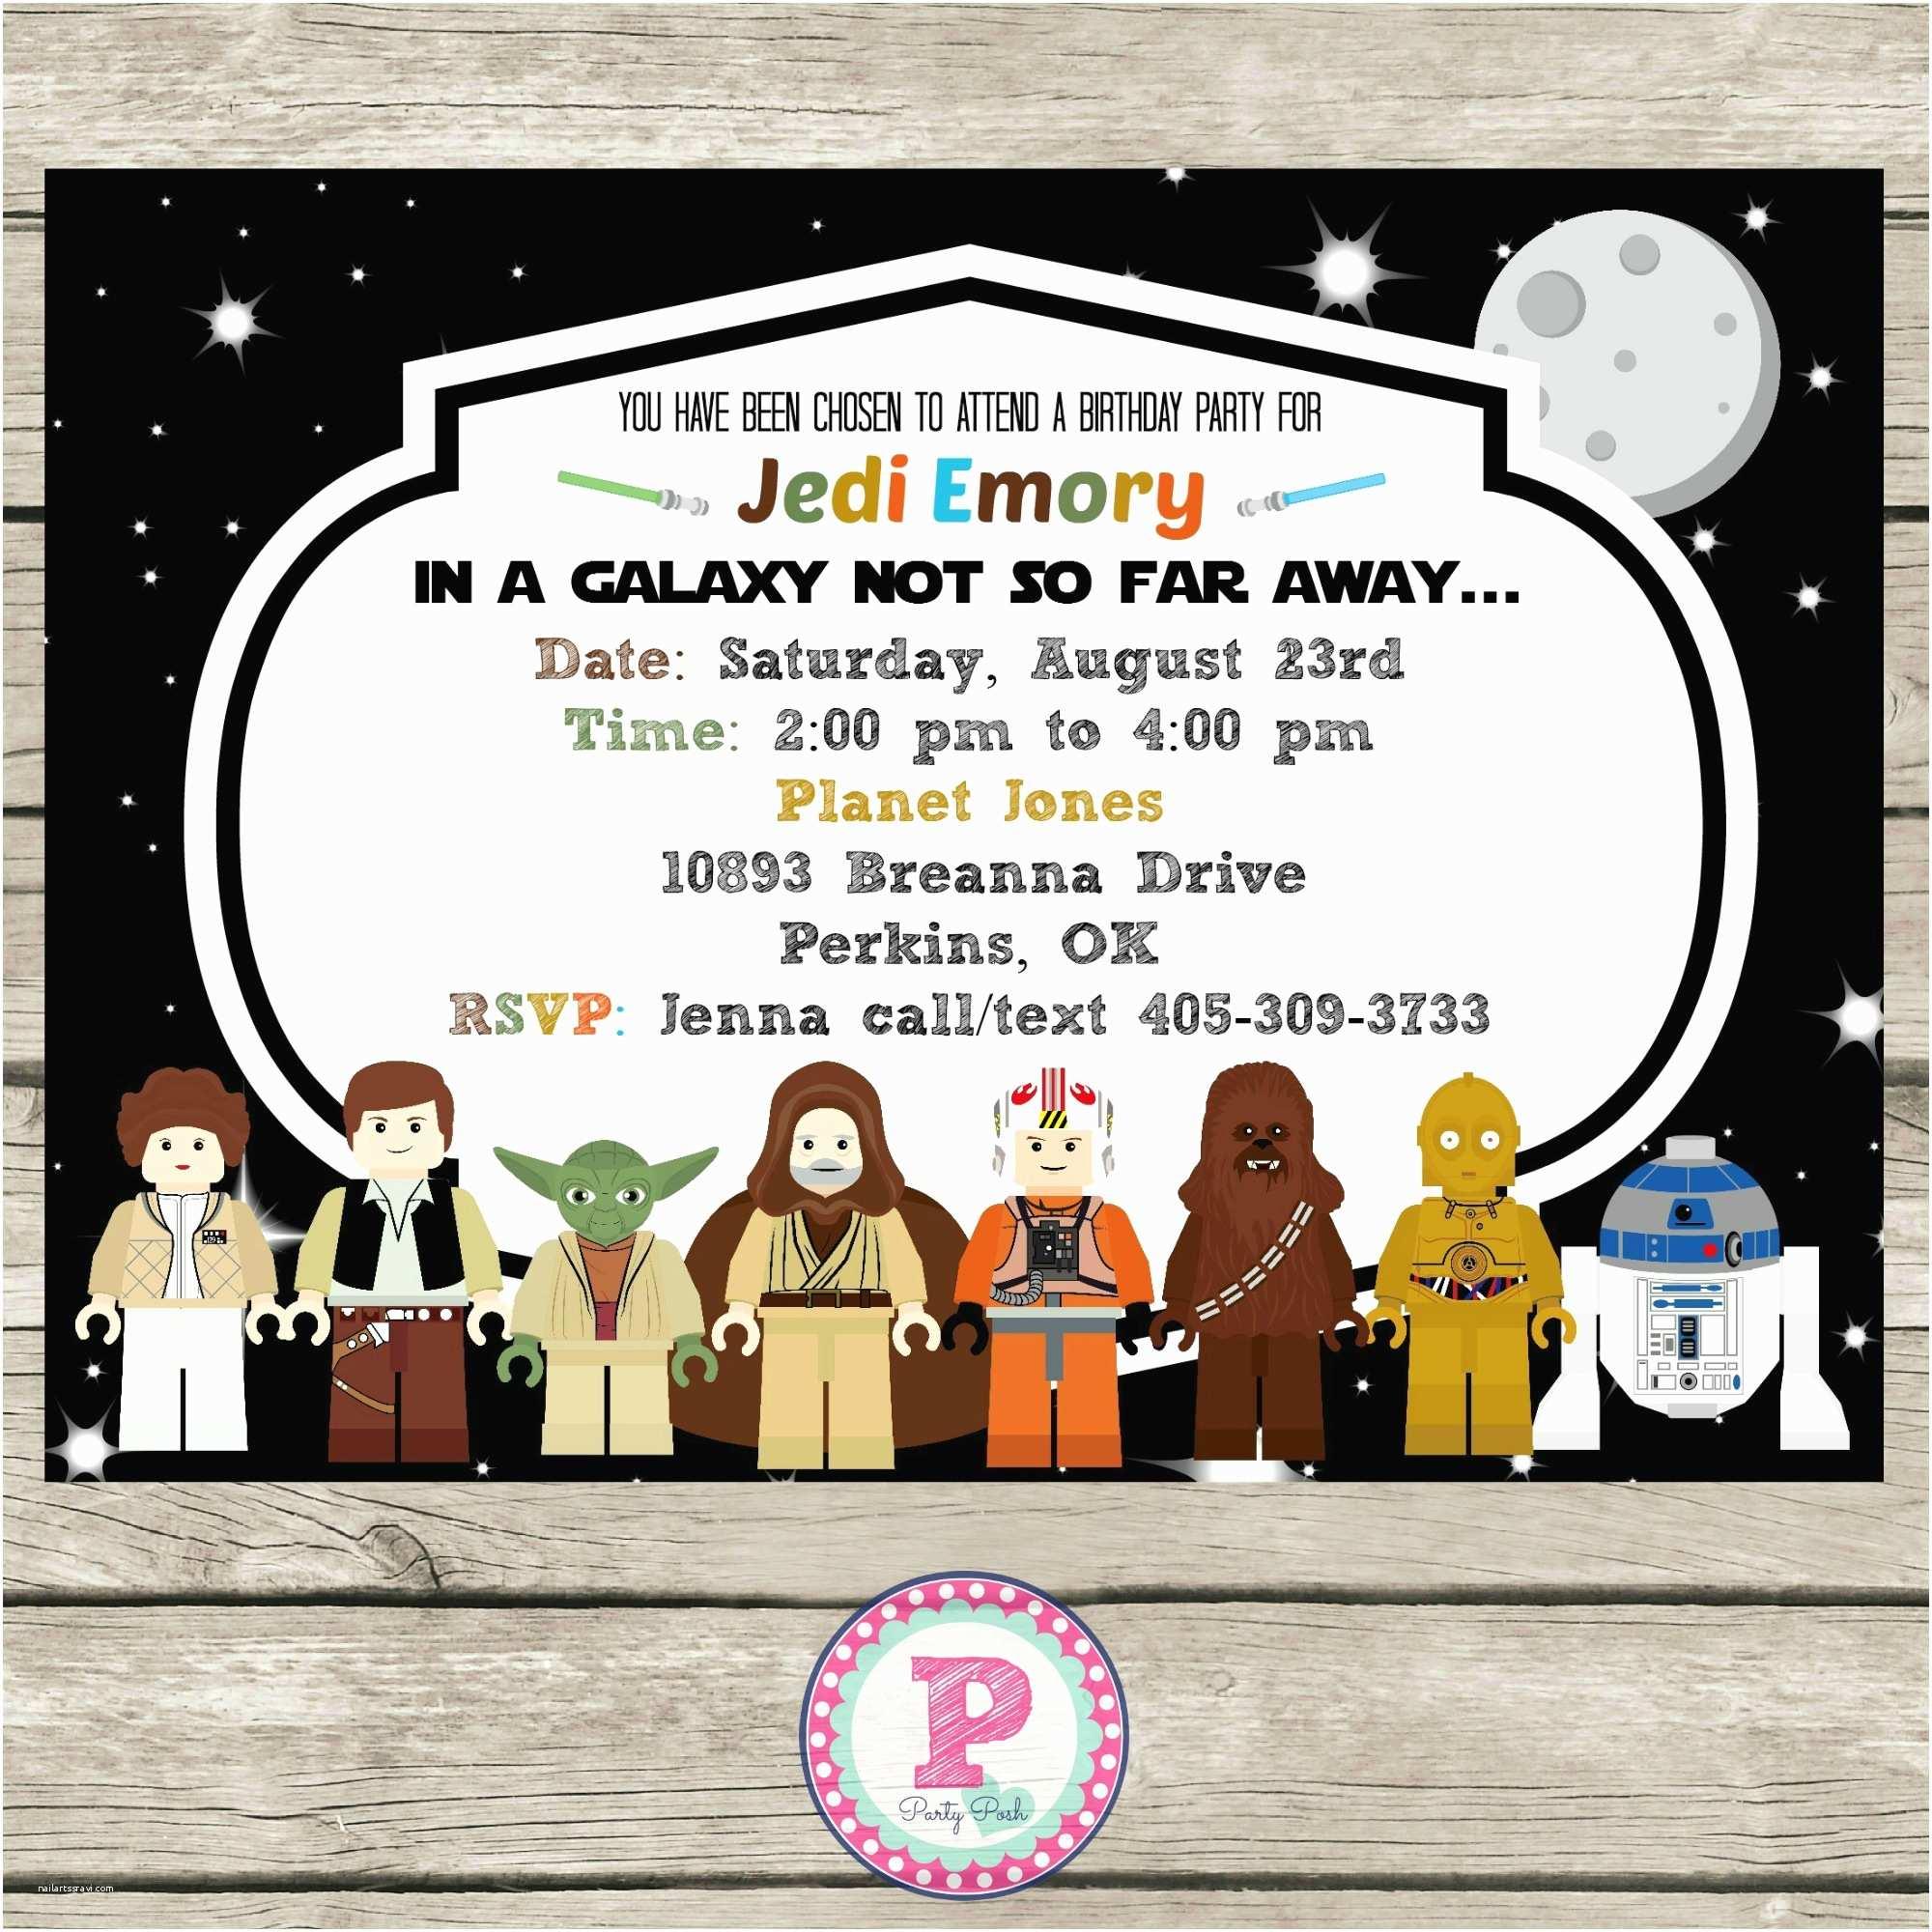 Star Wars Birthday Party Invitations Star Wars Birthday Invitations Wording